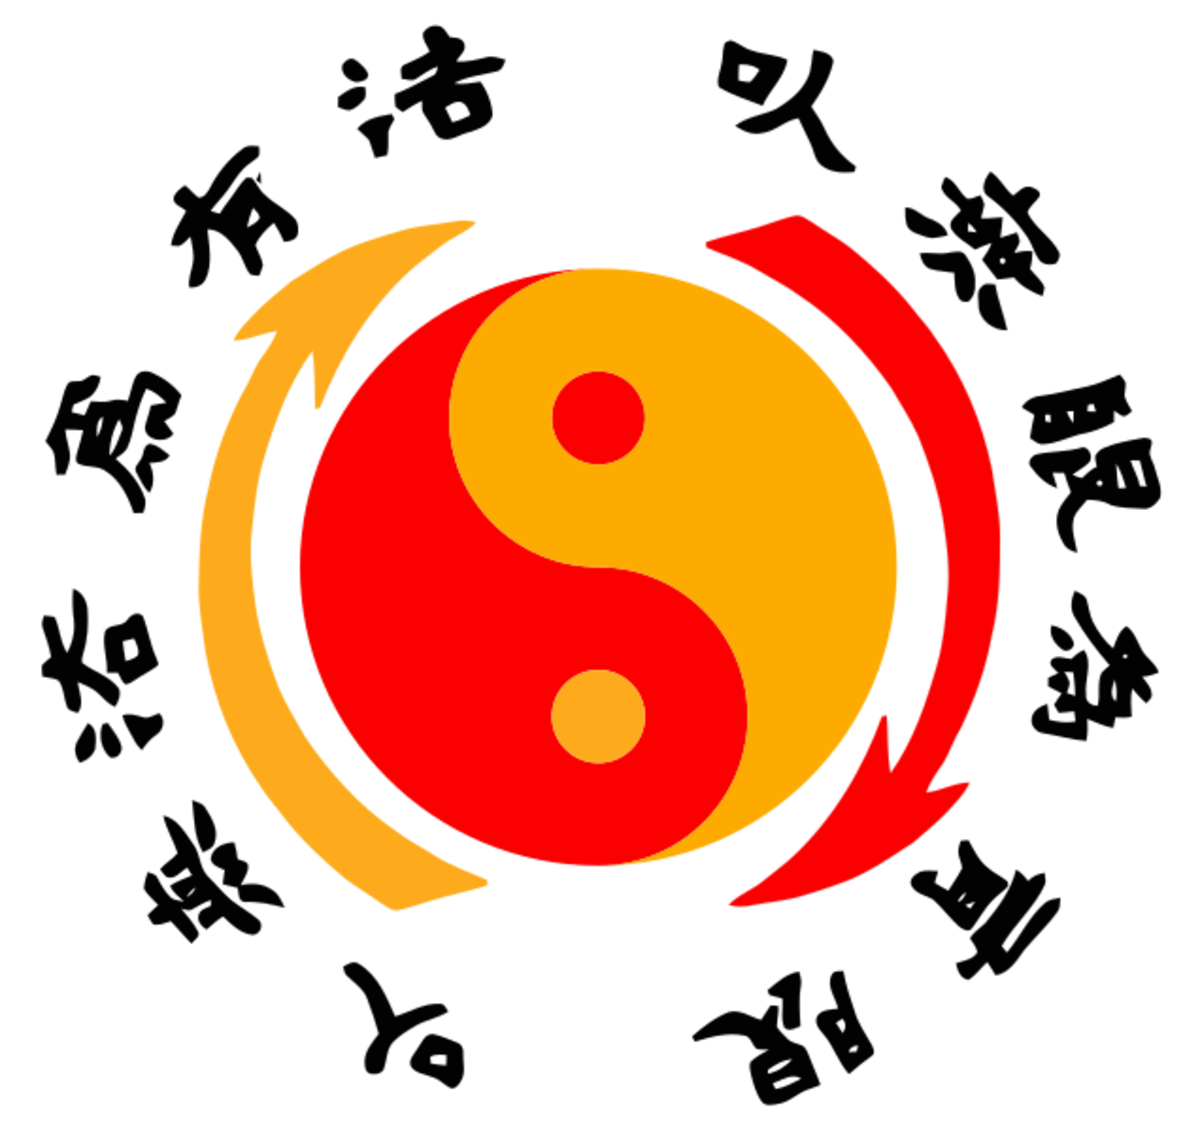 Jeet Kune Do uses symbolism similar to Tai Chi symbols, including Taoist Yin Yang.